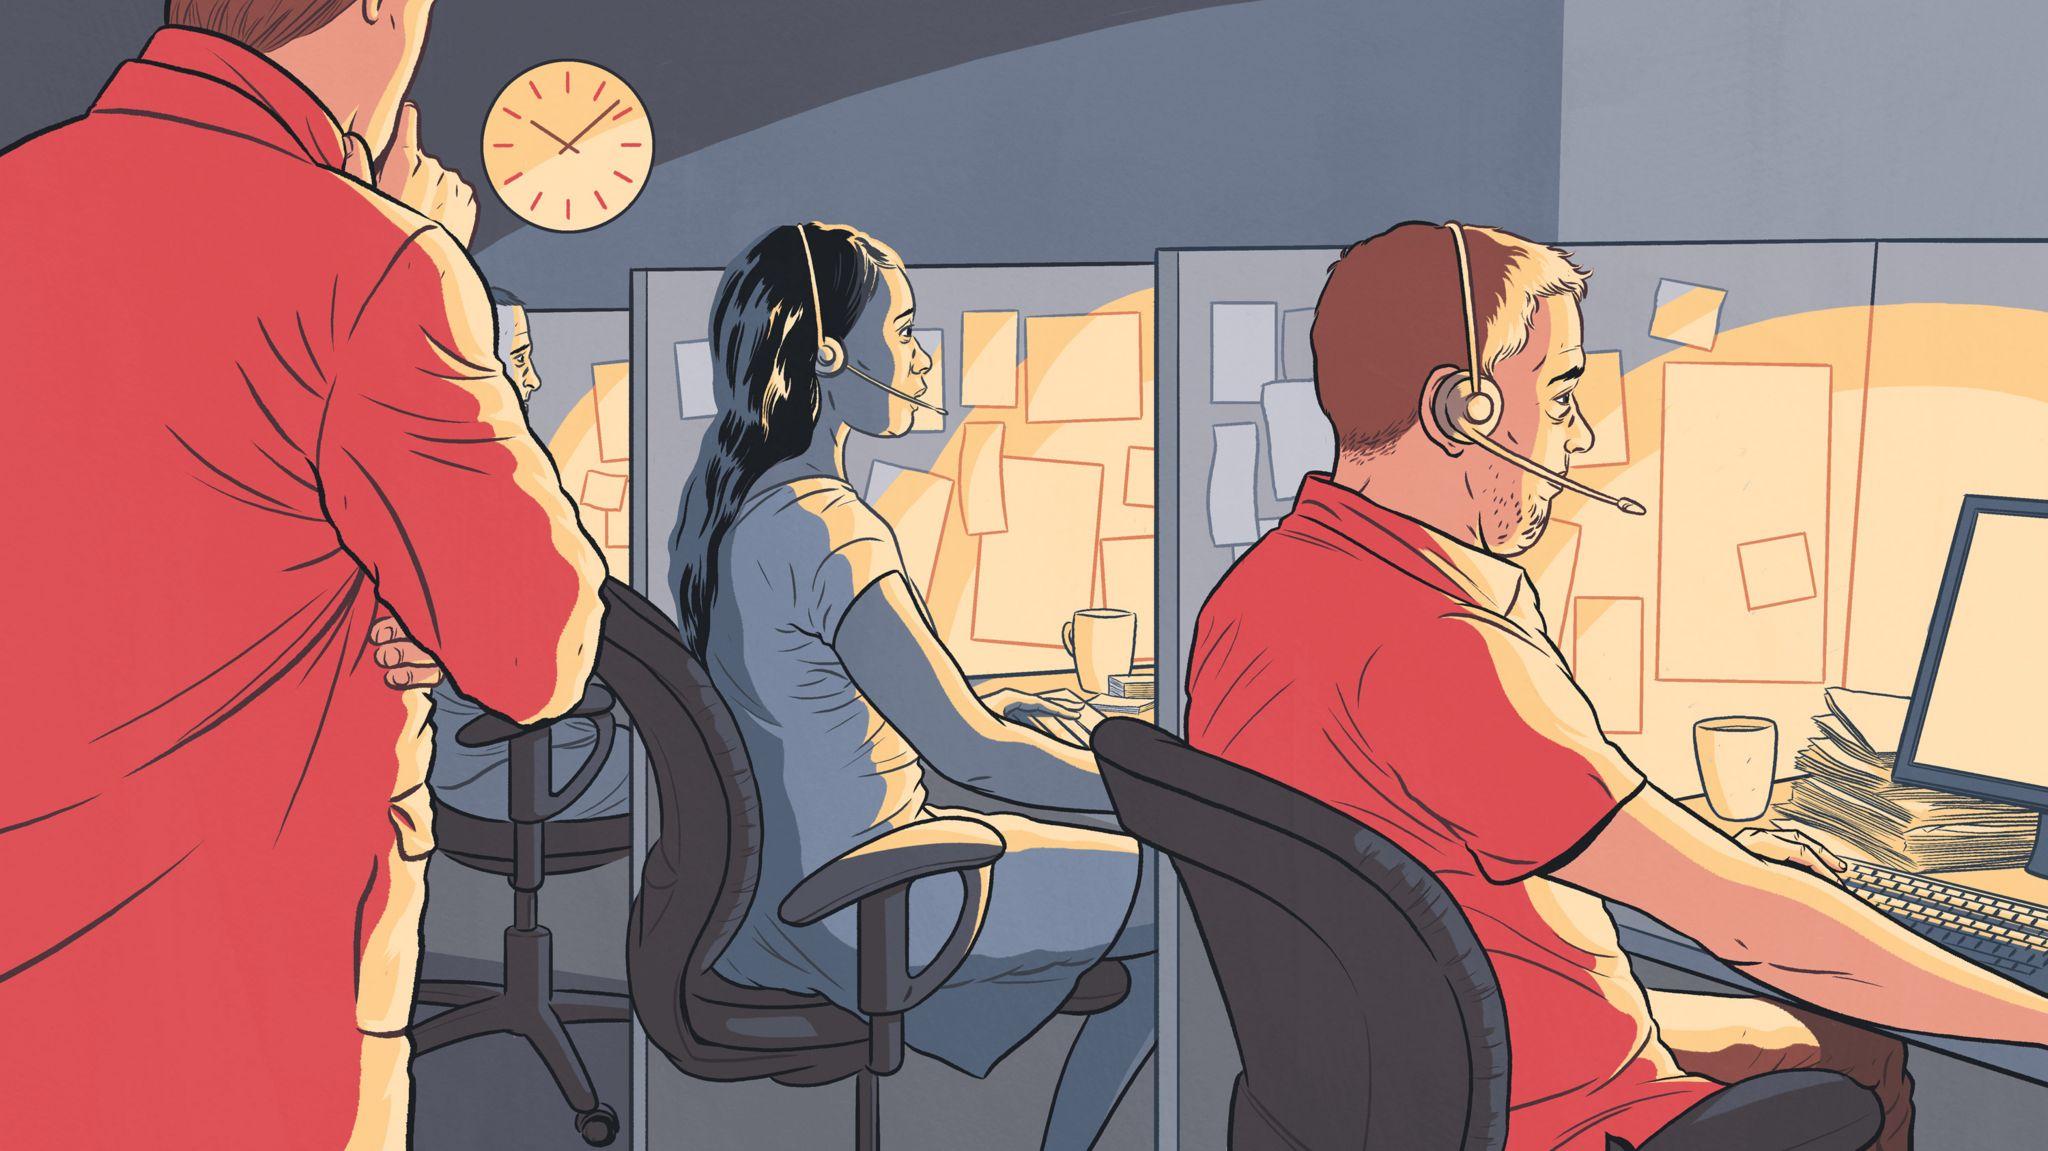 Asylum caseworkers at their desks